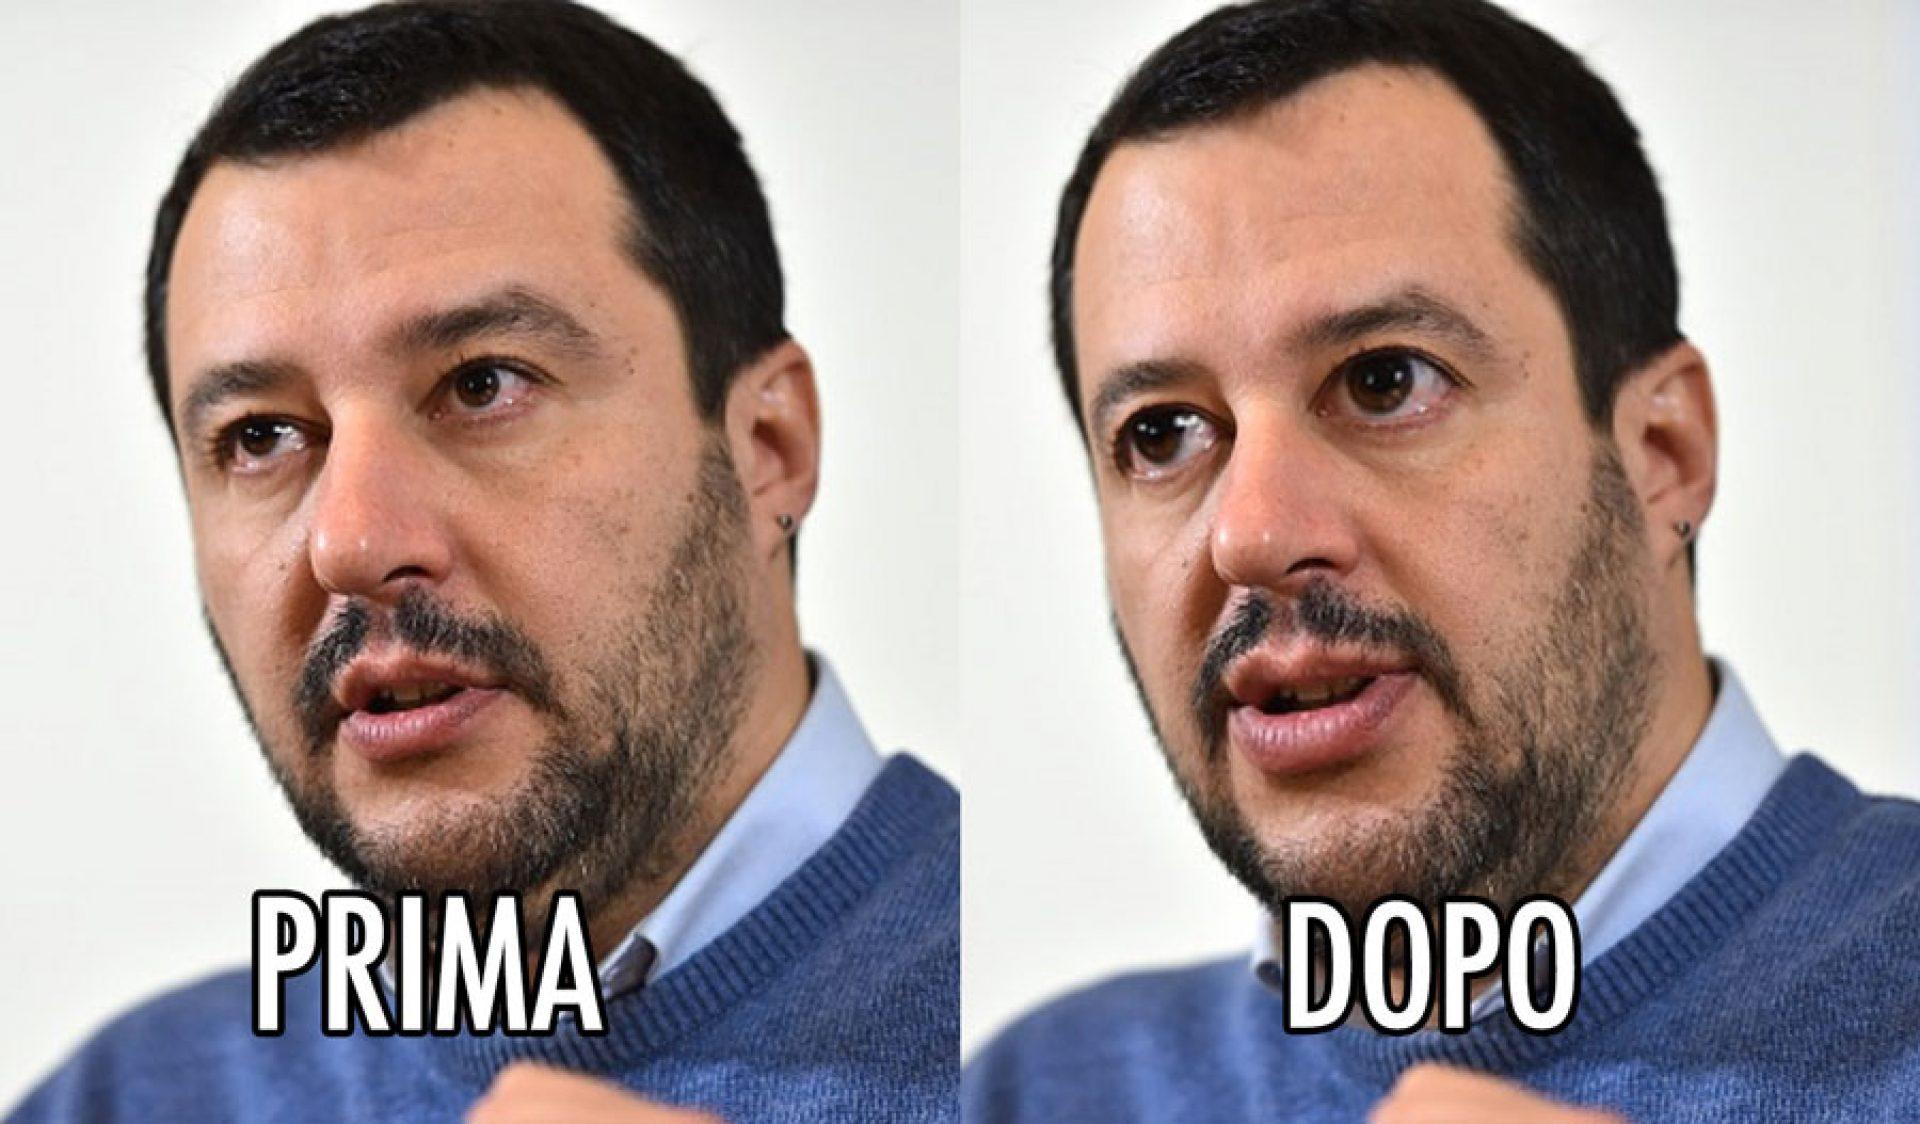 Matteo Salvini Lega Nord modificato Photoshop